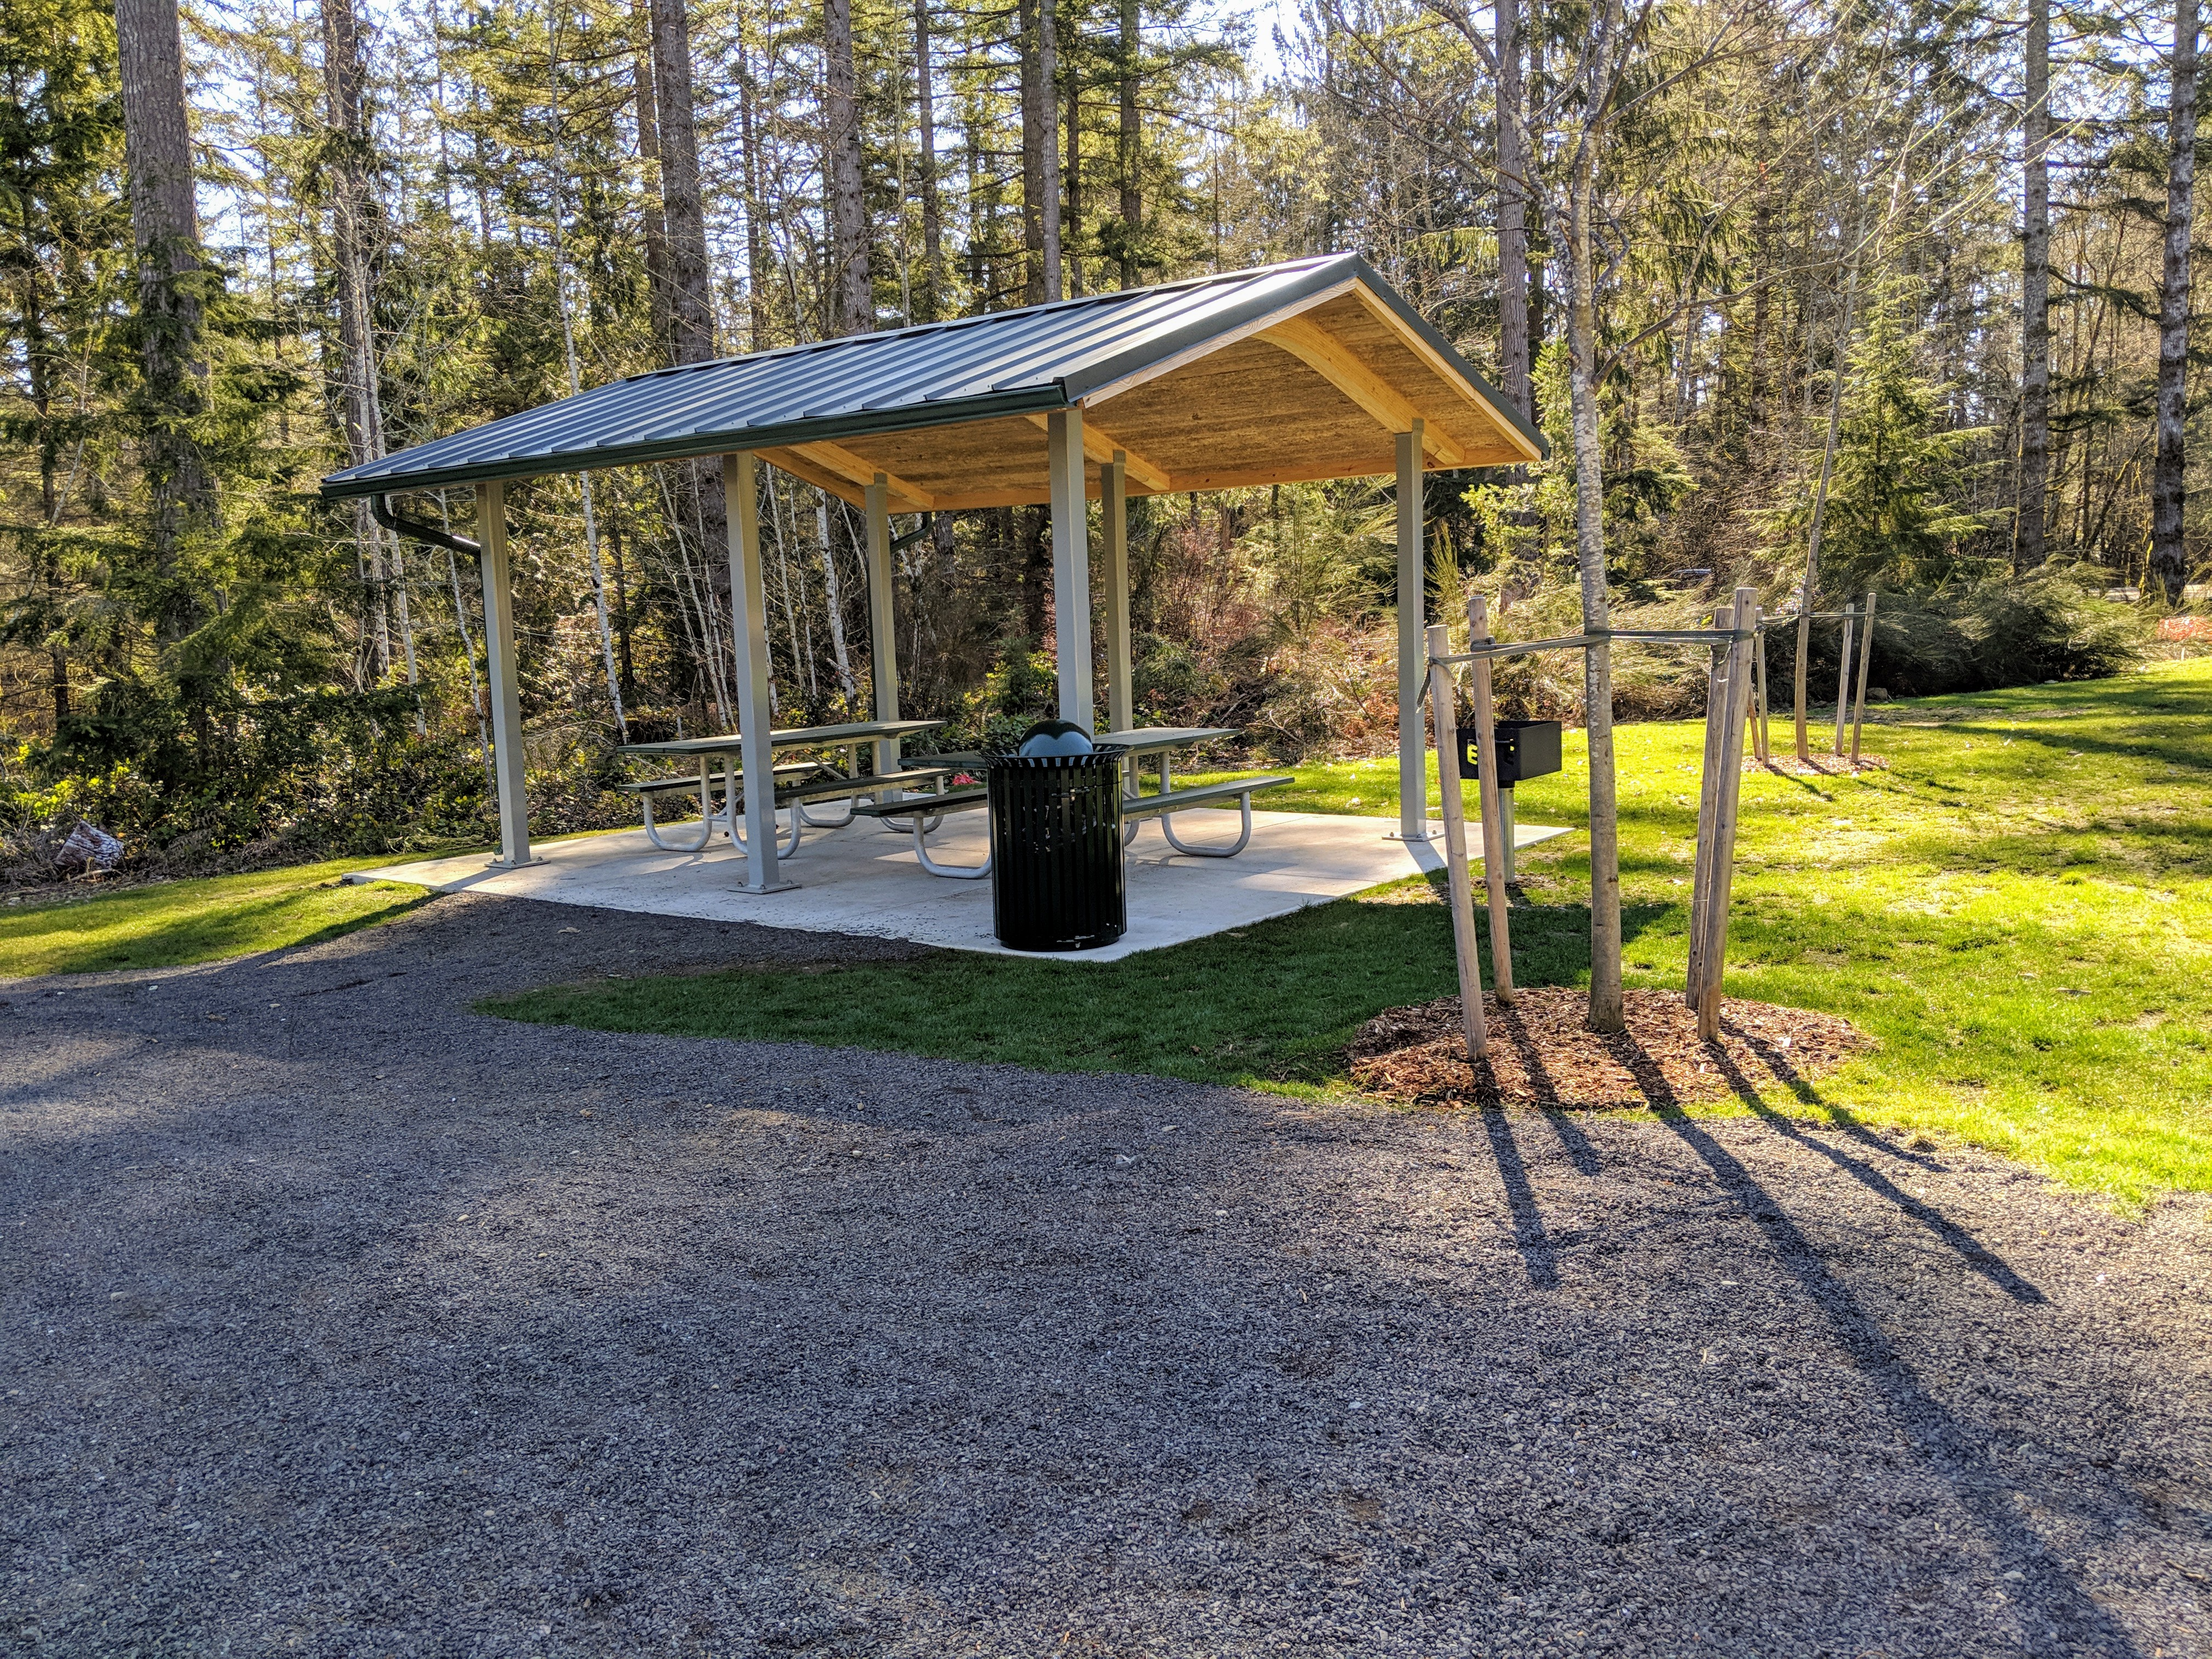 McCormick Village Park Picnic Shelter